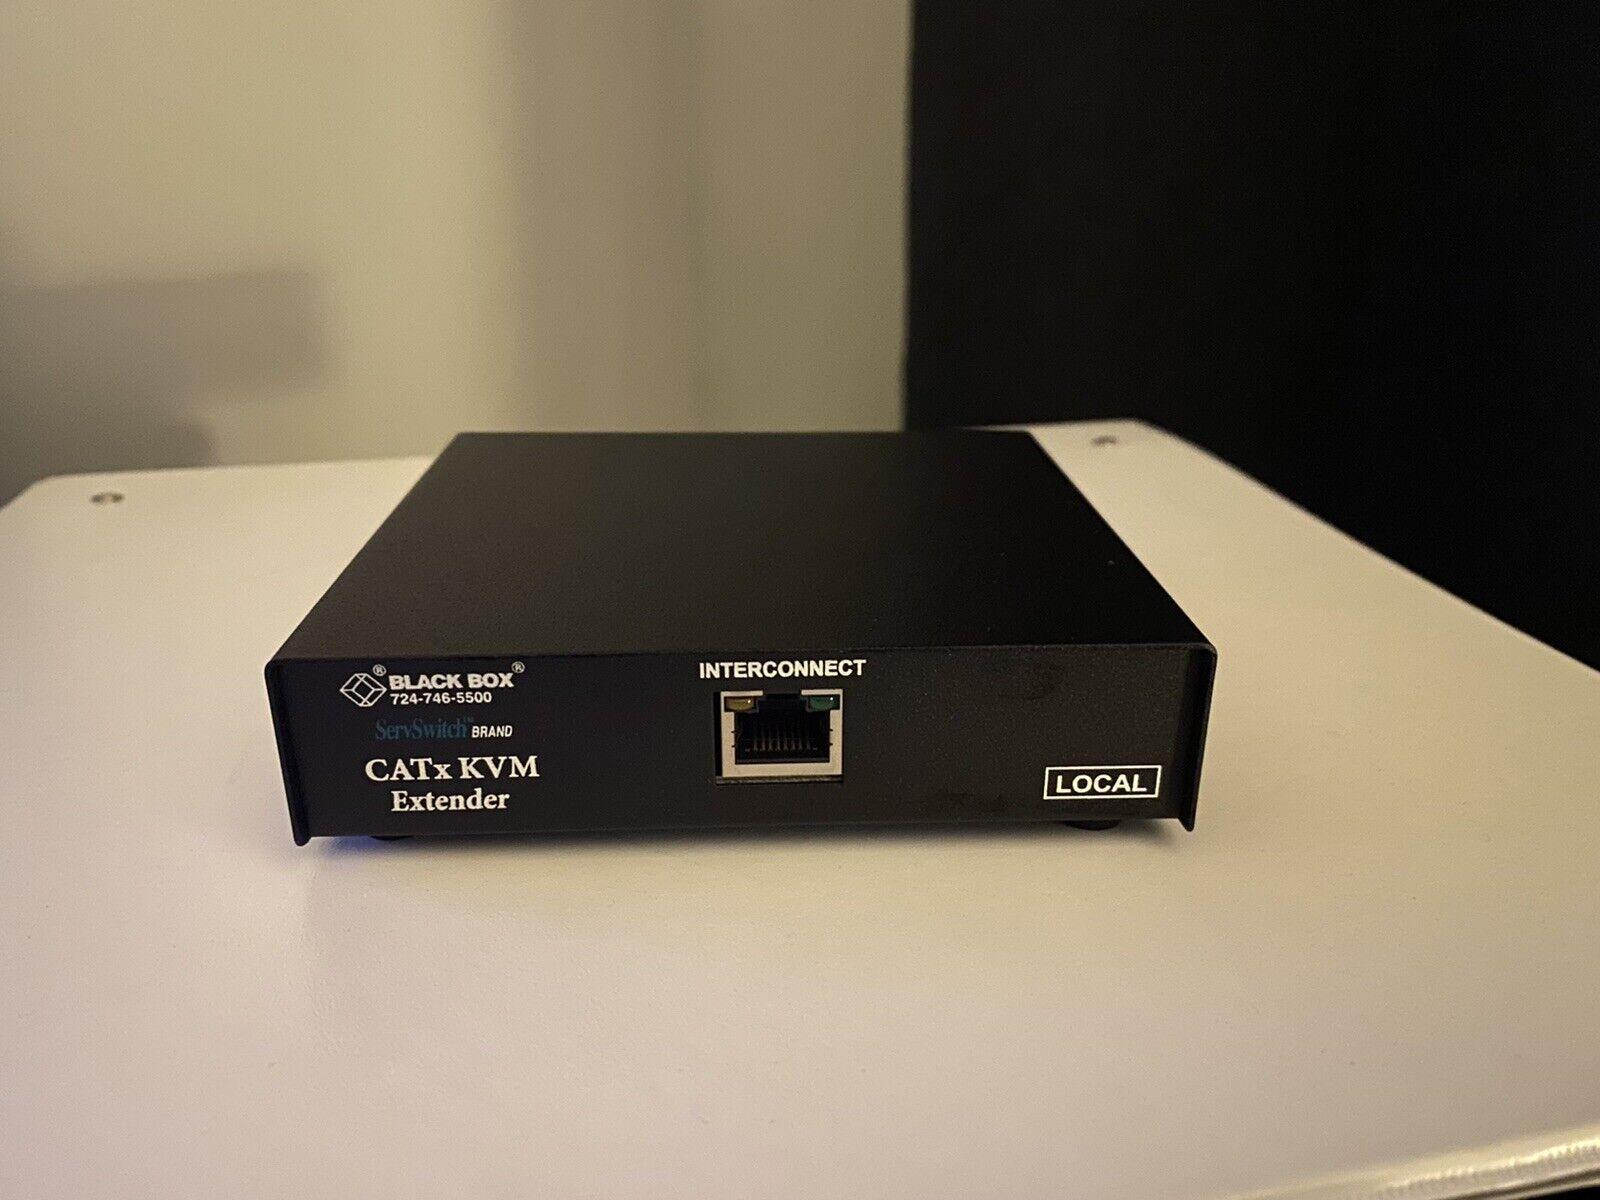 BLACK BOX ACU6001A SERVSWITCH BRAND CATX USB KVM EXTENDER *